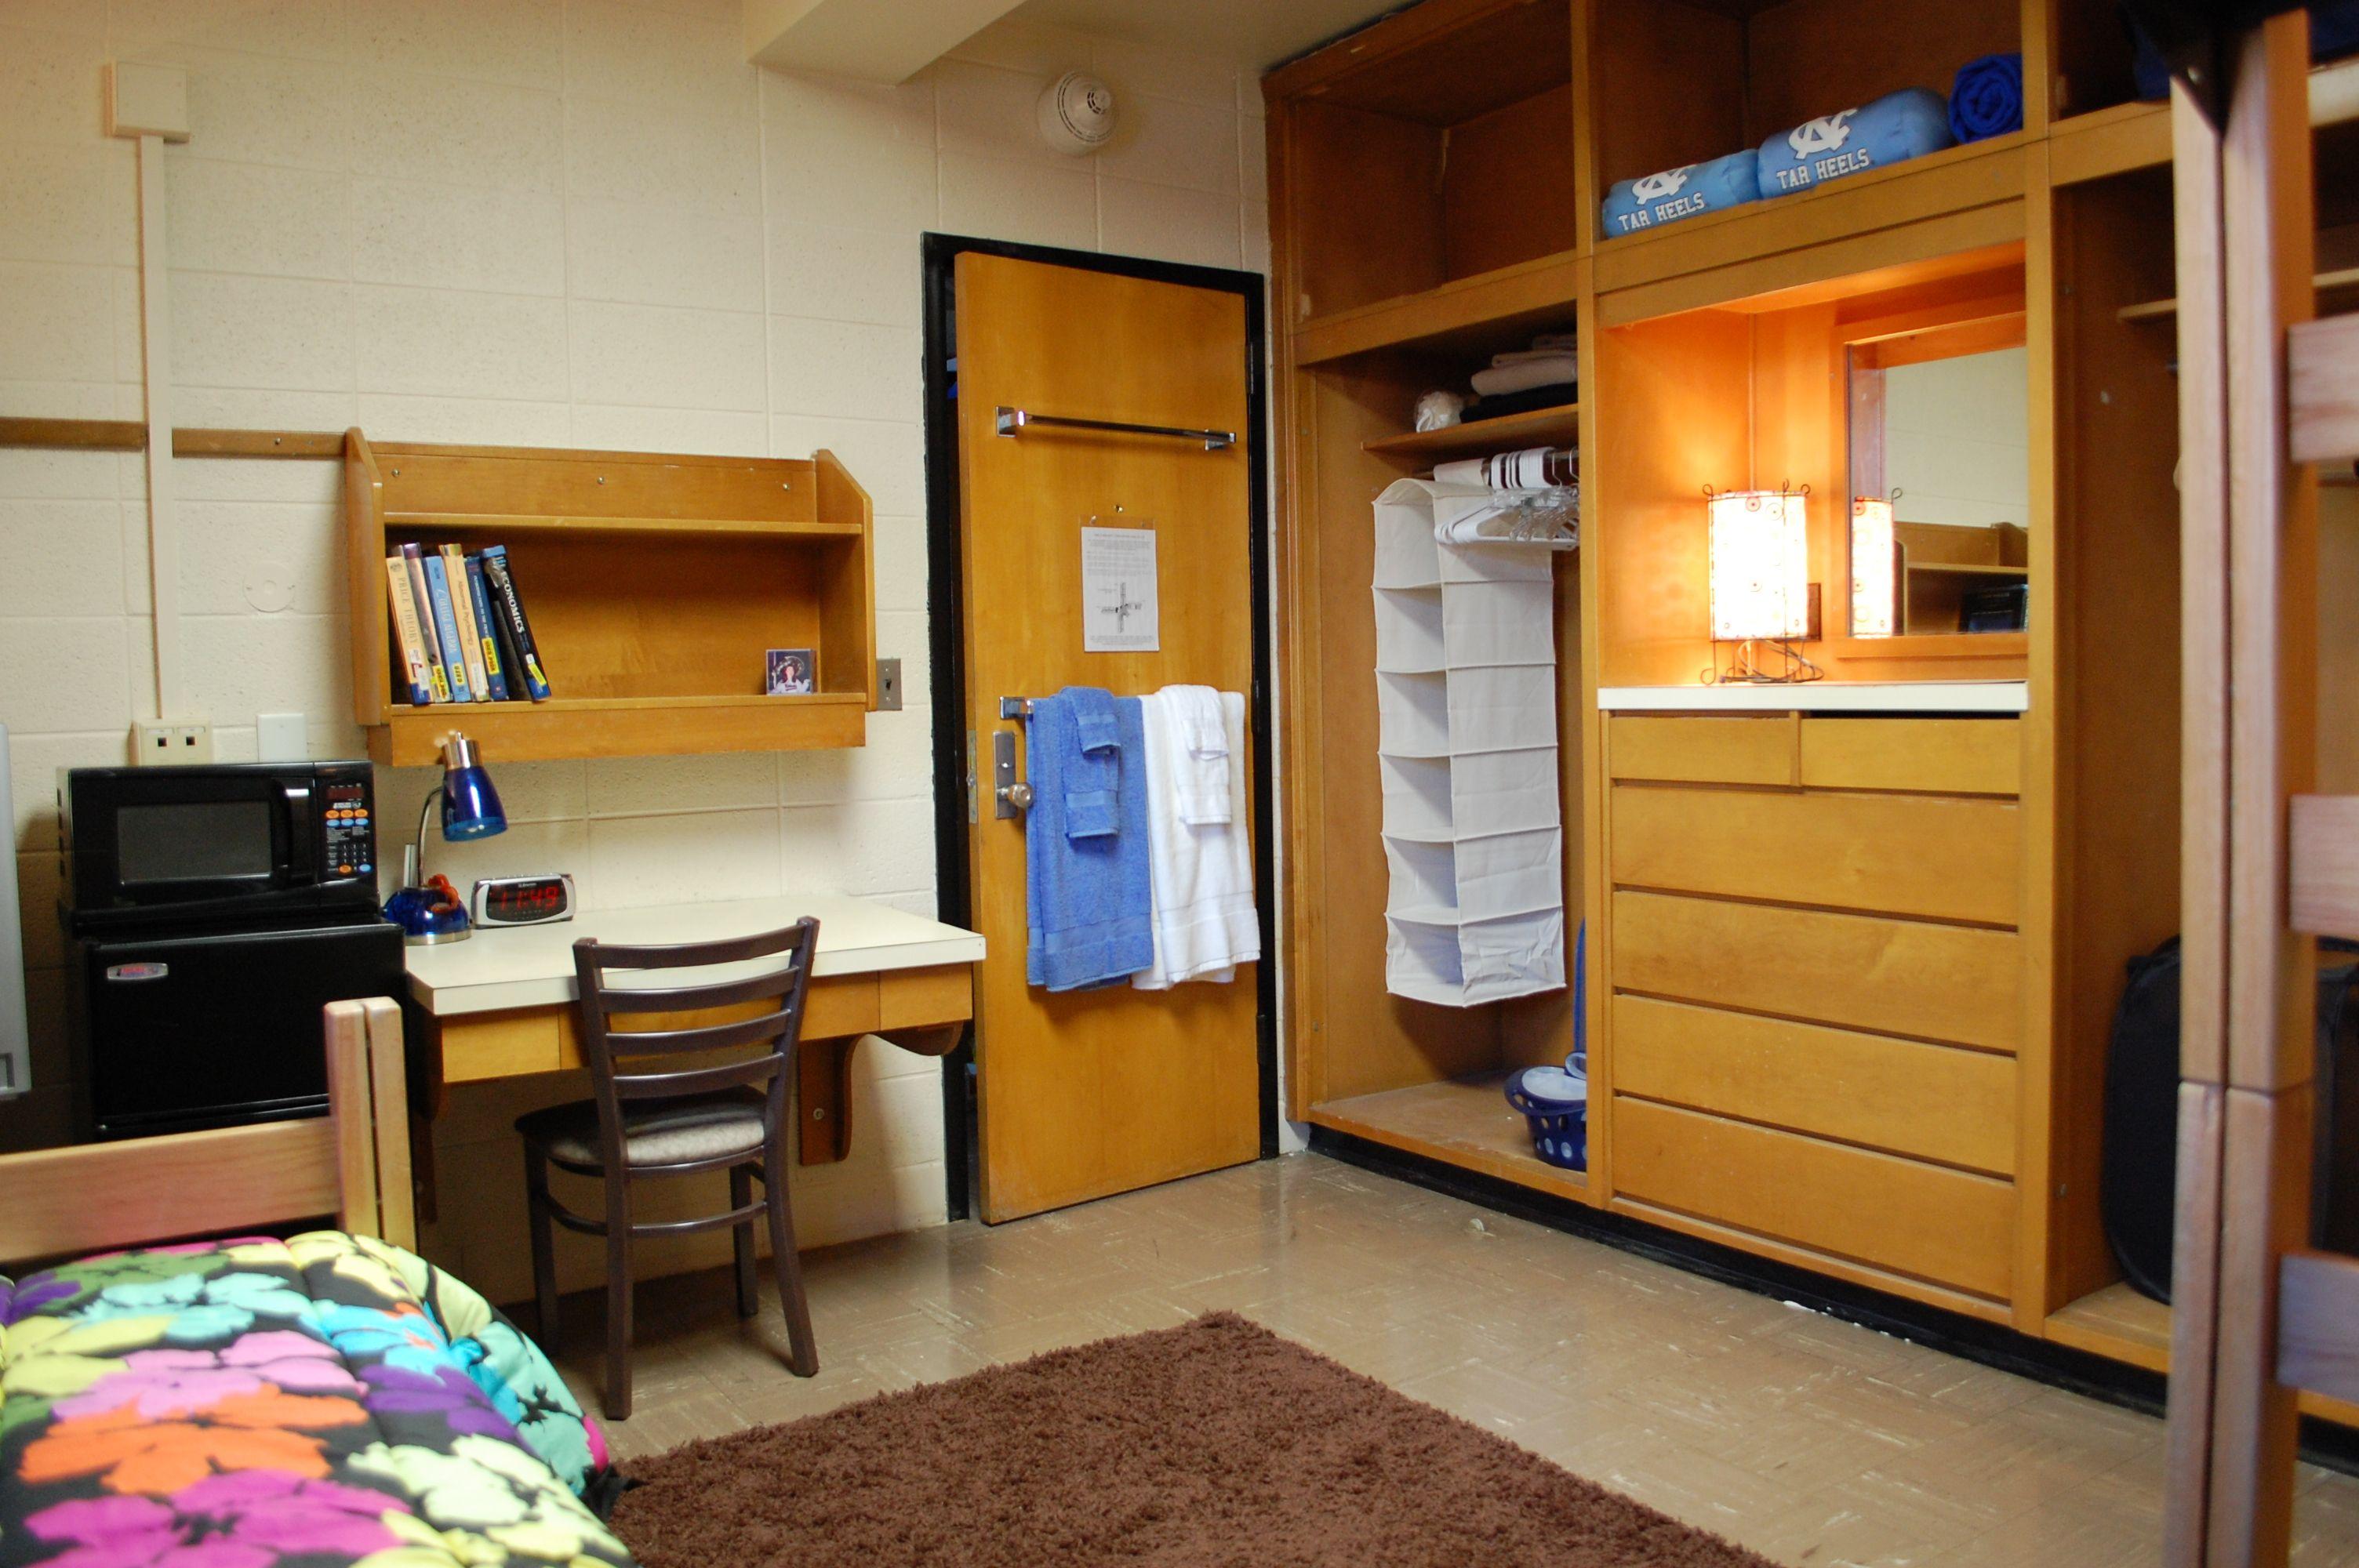 23 U N C D O R M S Ideas Dorm Room Dorm College Dorm